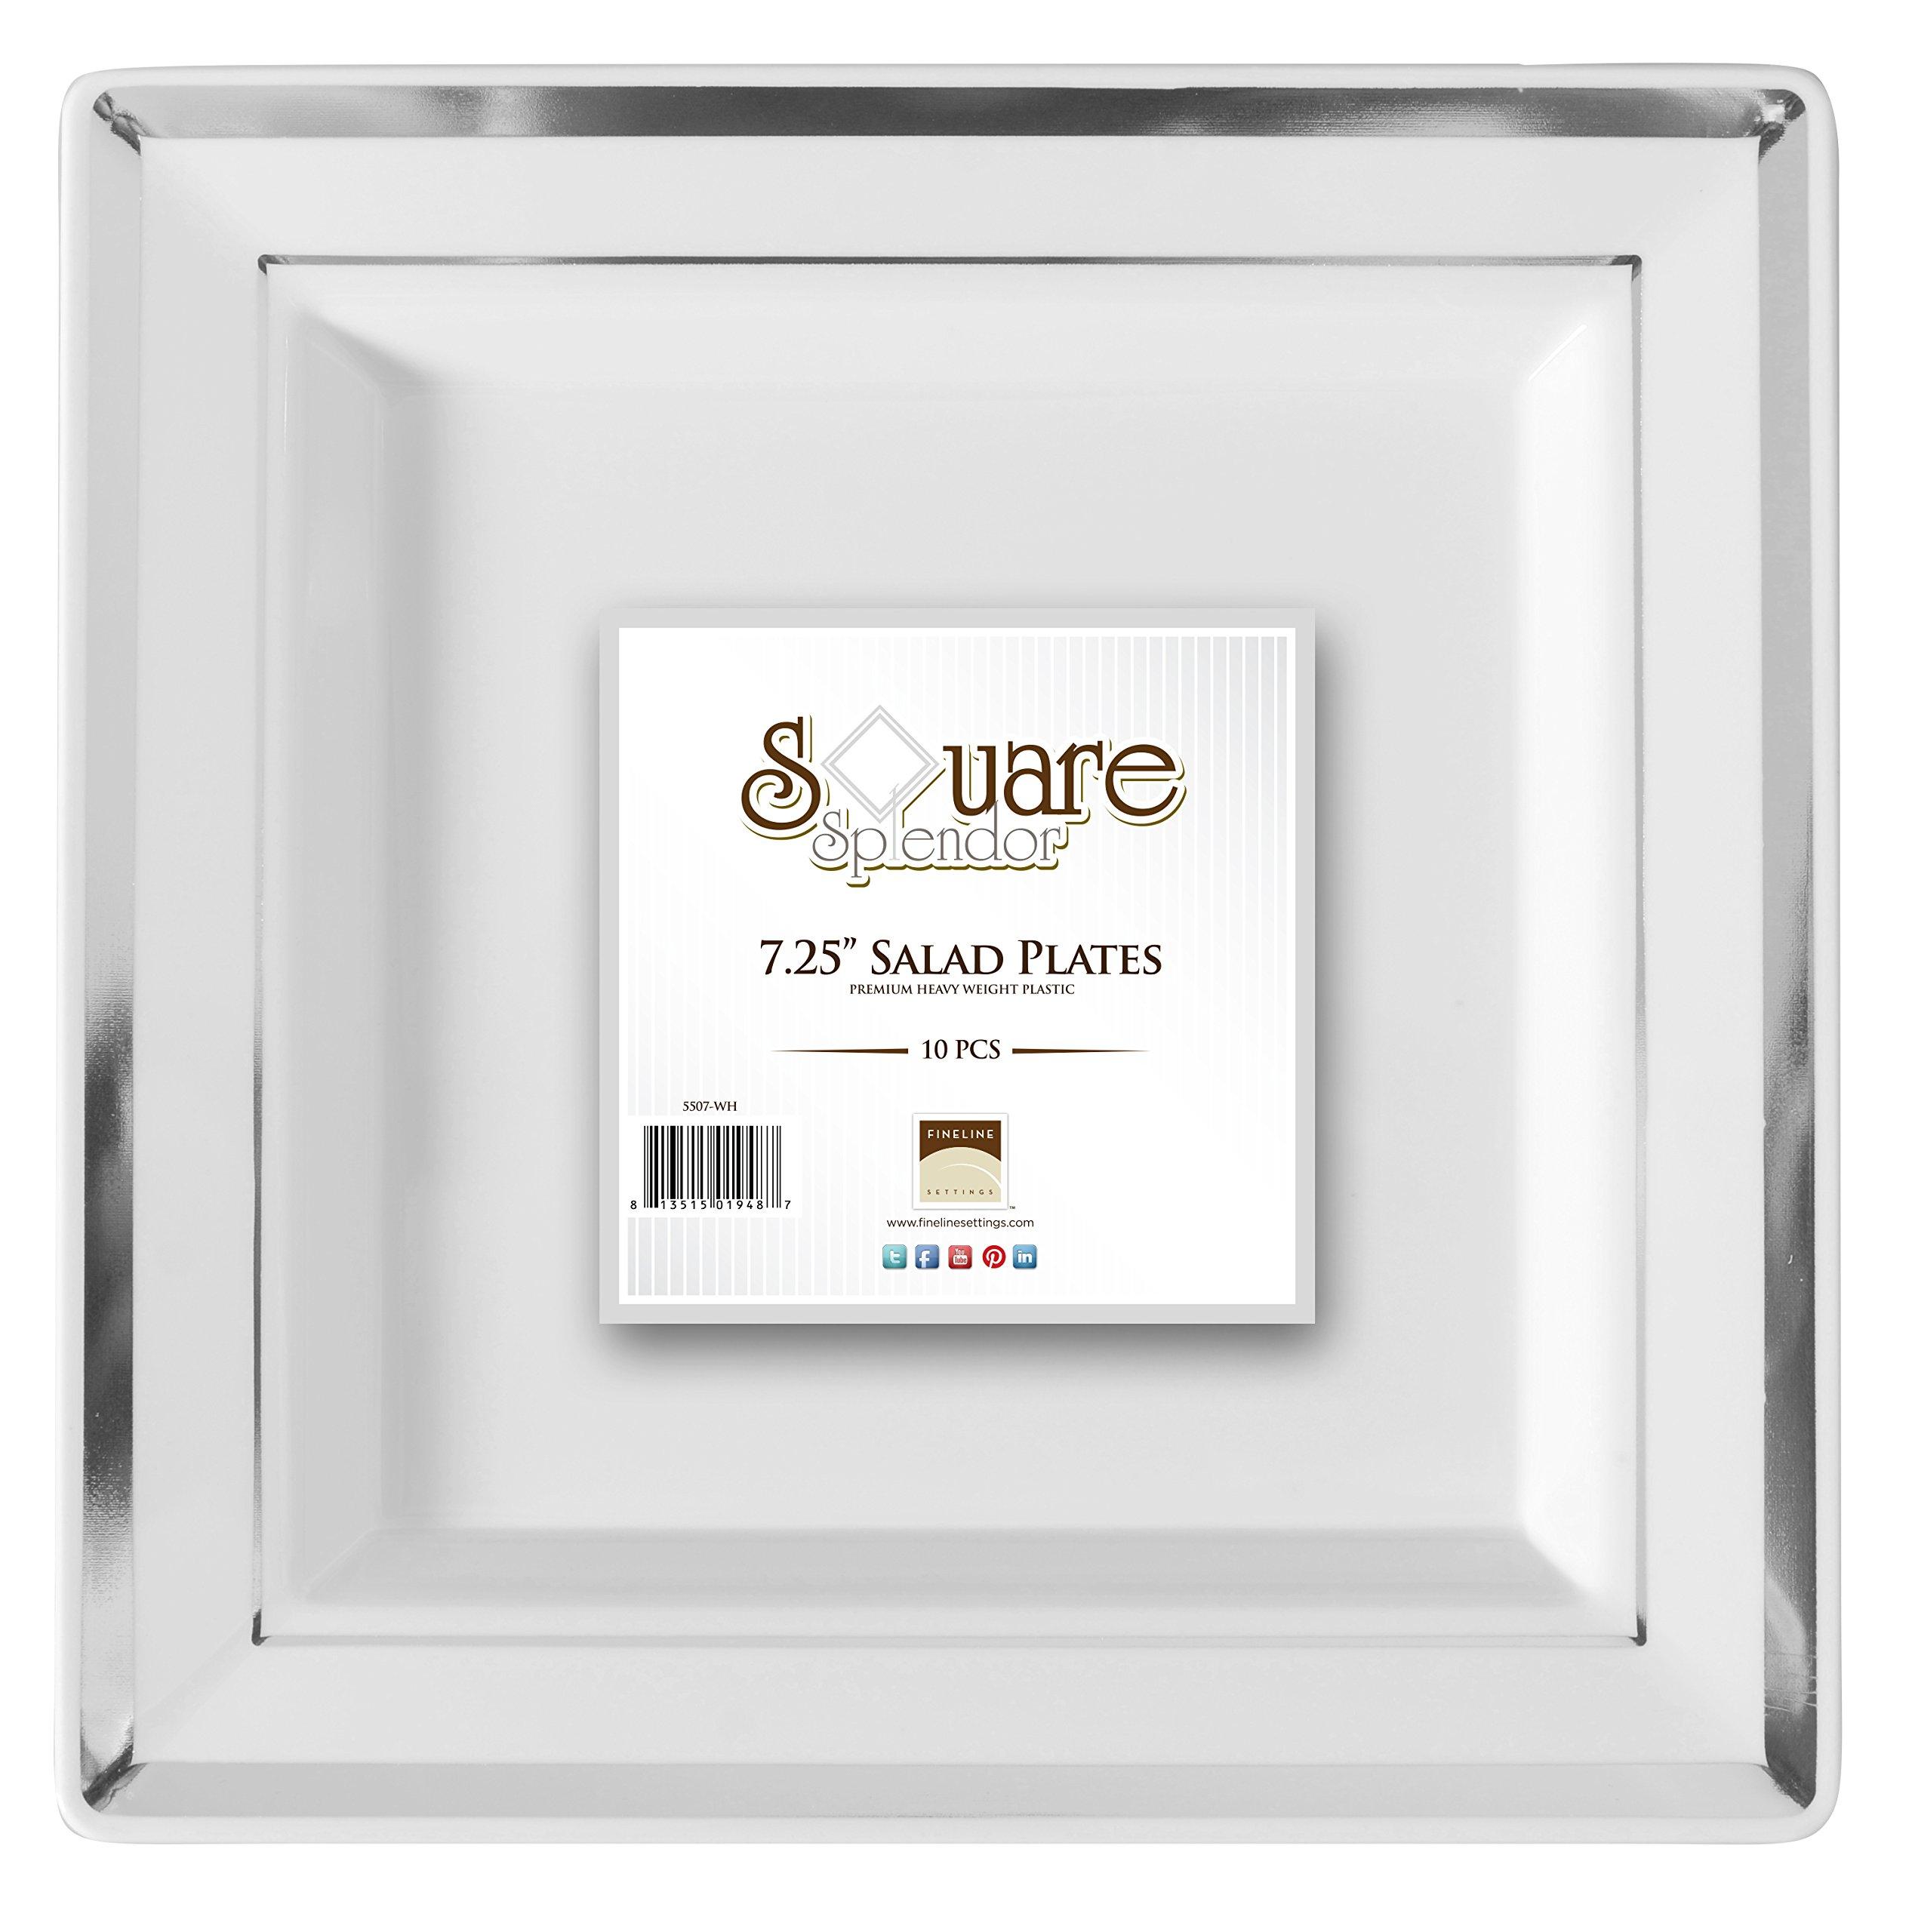 Square Splendor 5507-WH Trim Square Dessert Plate, 7.25-Inch, White and Silver, Pack of 120 by Square Splendor (Image #5)